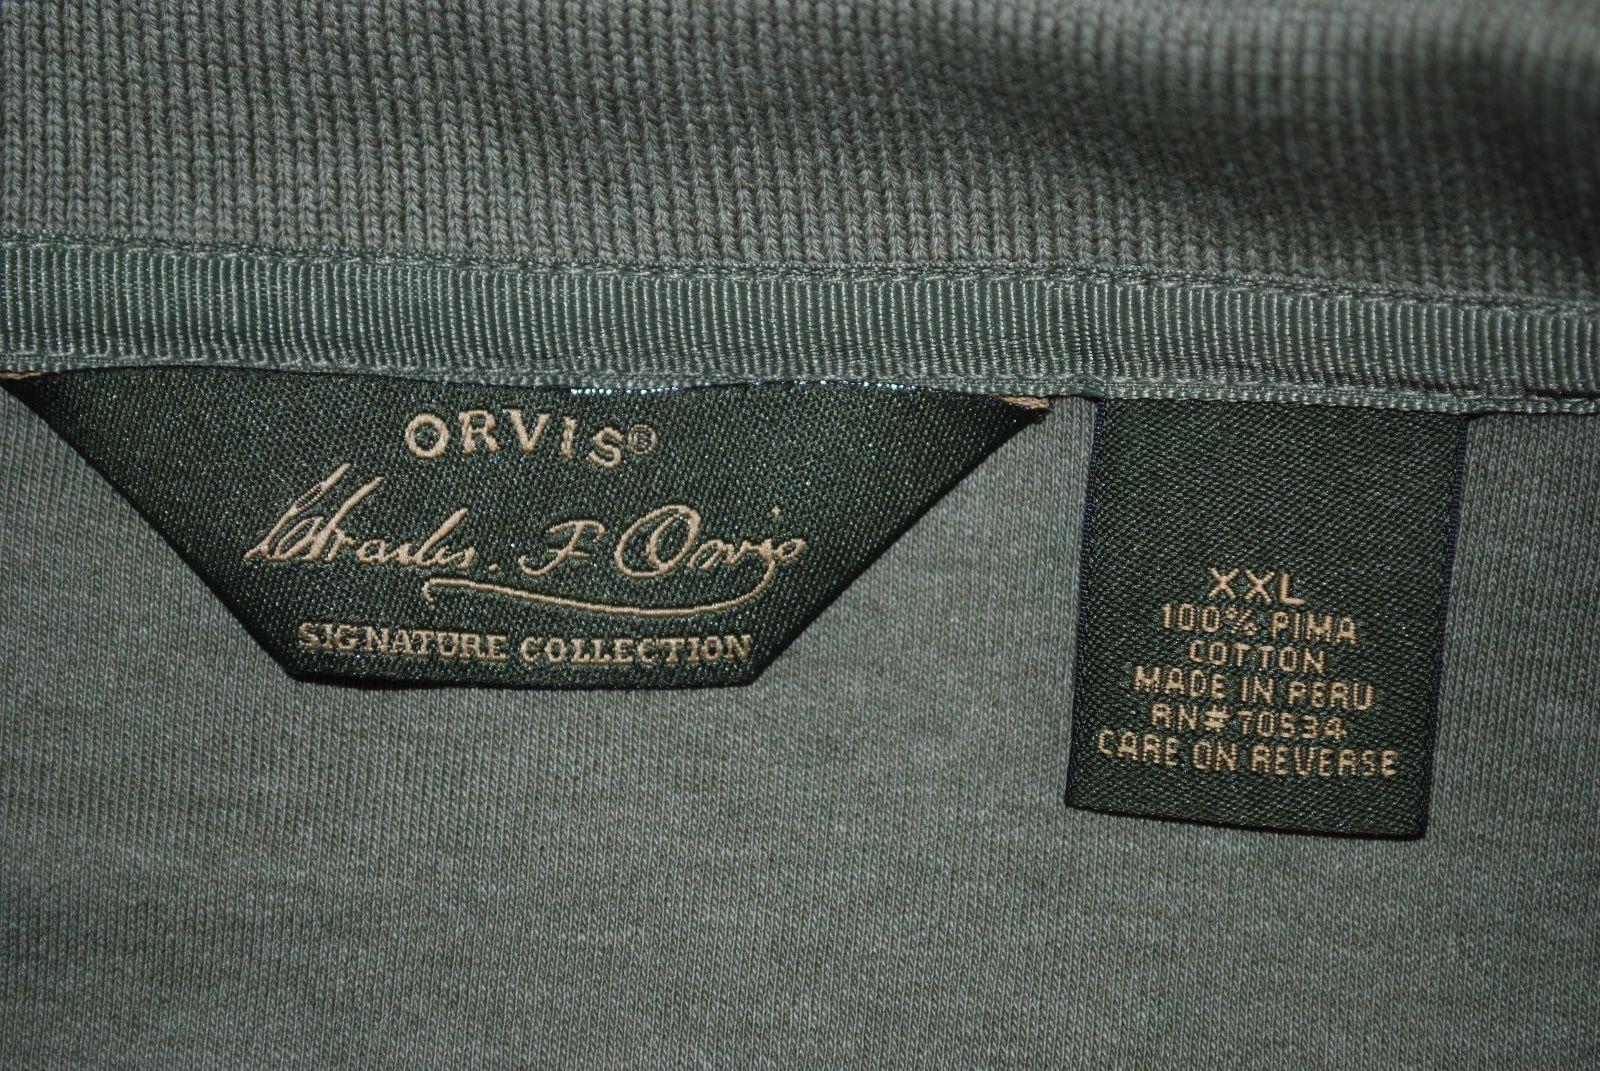 6b6a86c6f27 ORVIS SIGNATURE Men's Long Sleeve Polo Shirt Size XXL 100% Pima Cotton Green